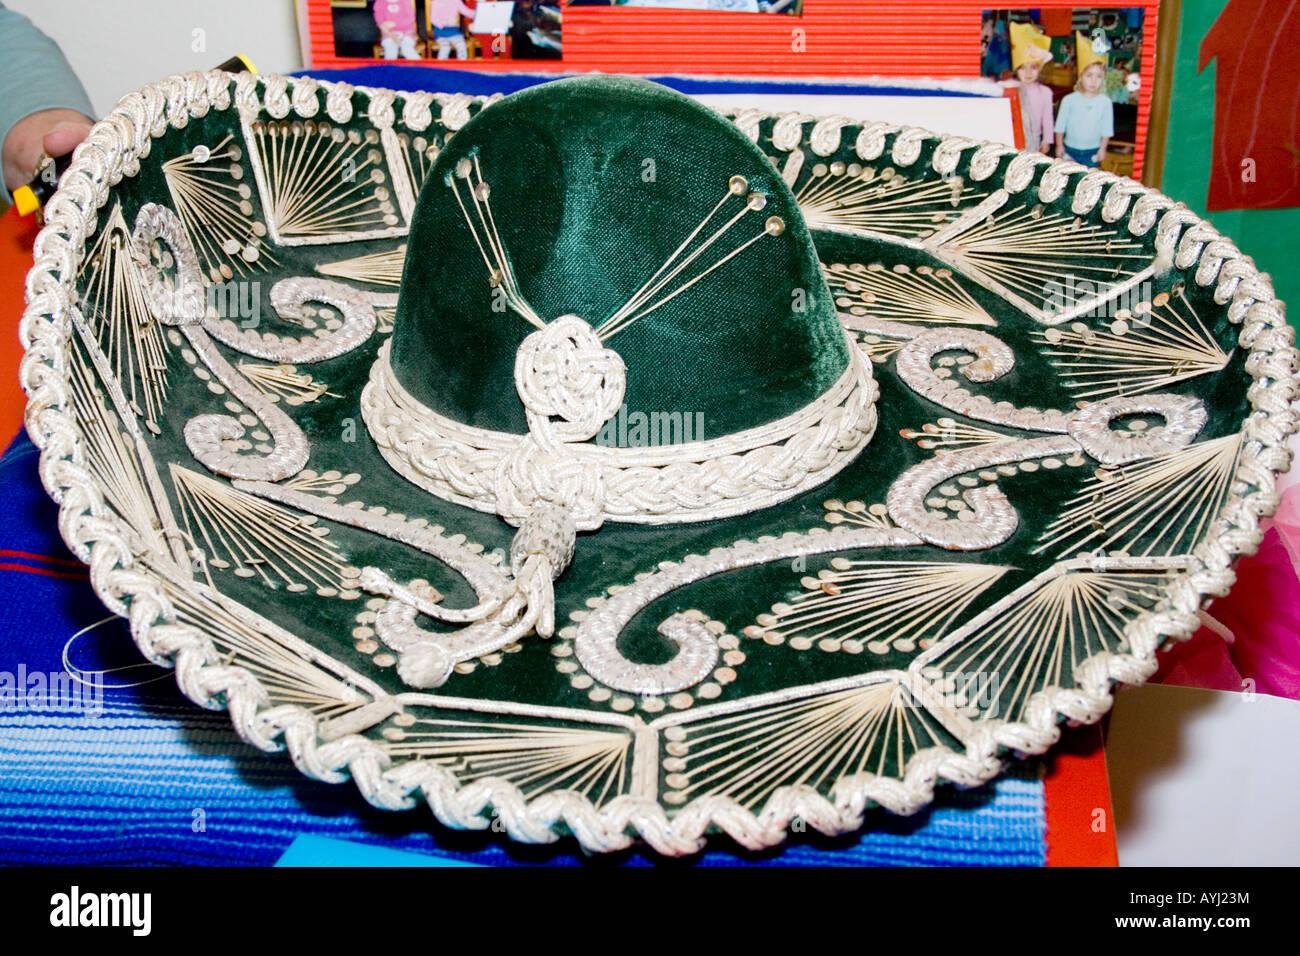 Decorative fancy Cinco de Mayo sombrero wide brimmed Mexican hat. St Paul  Minnesota USA 78e12c637ca